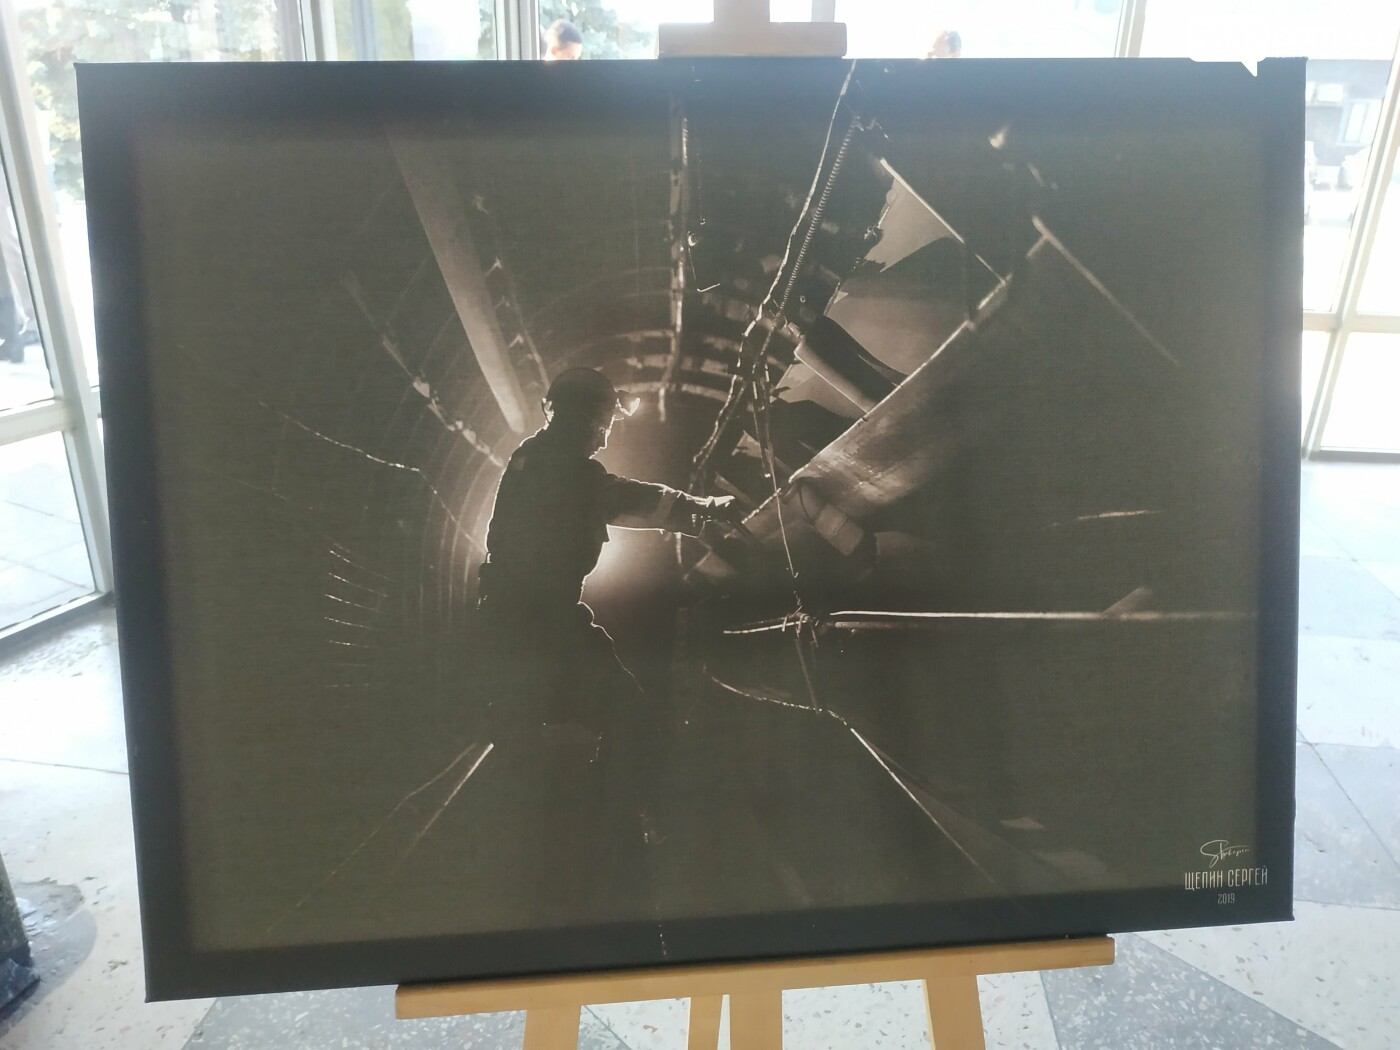 Накануне Дня шахтёра в Павлограде прошла фотовыставка, фото-5